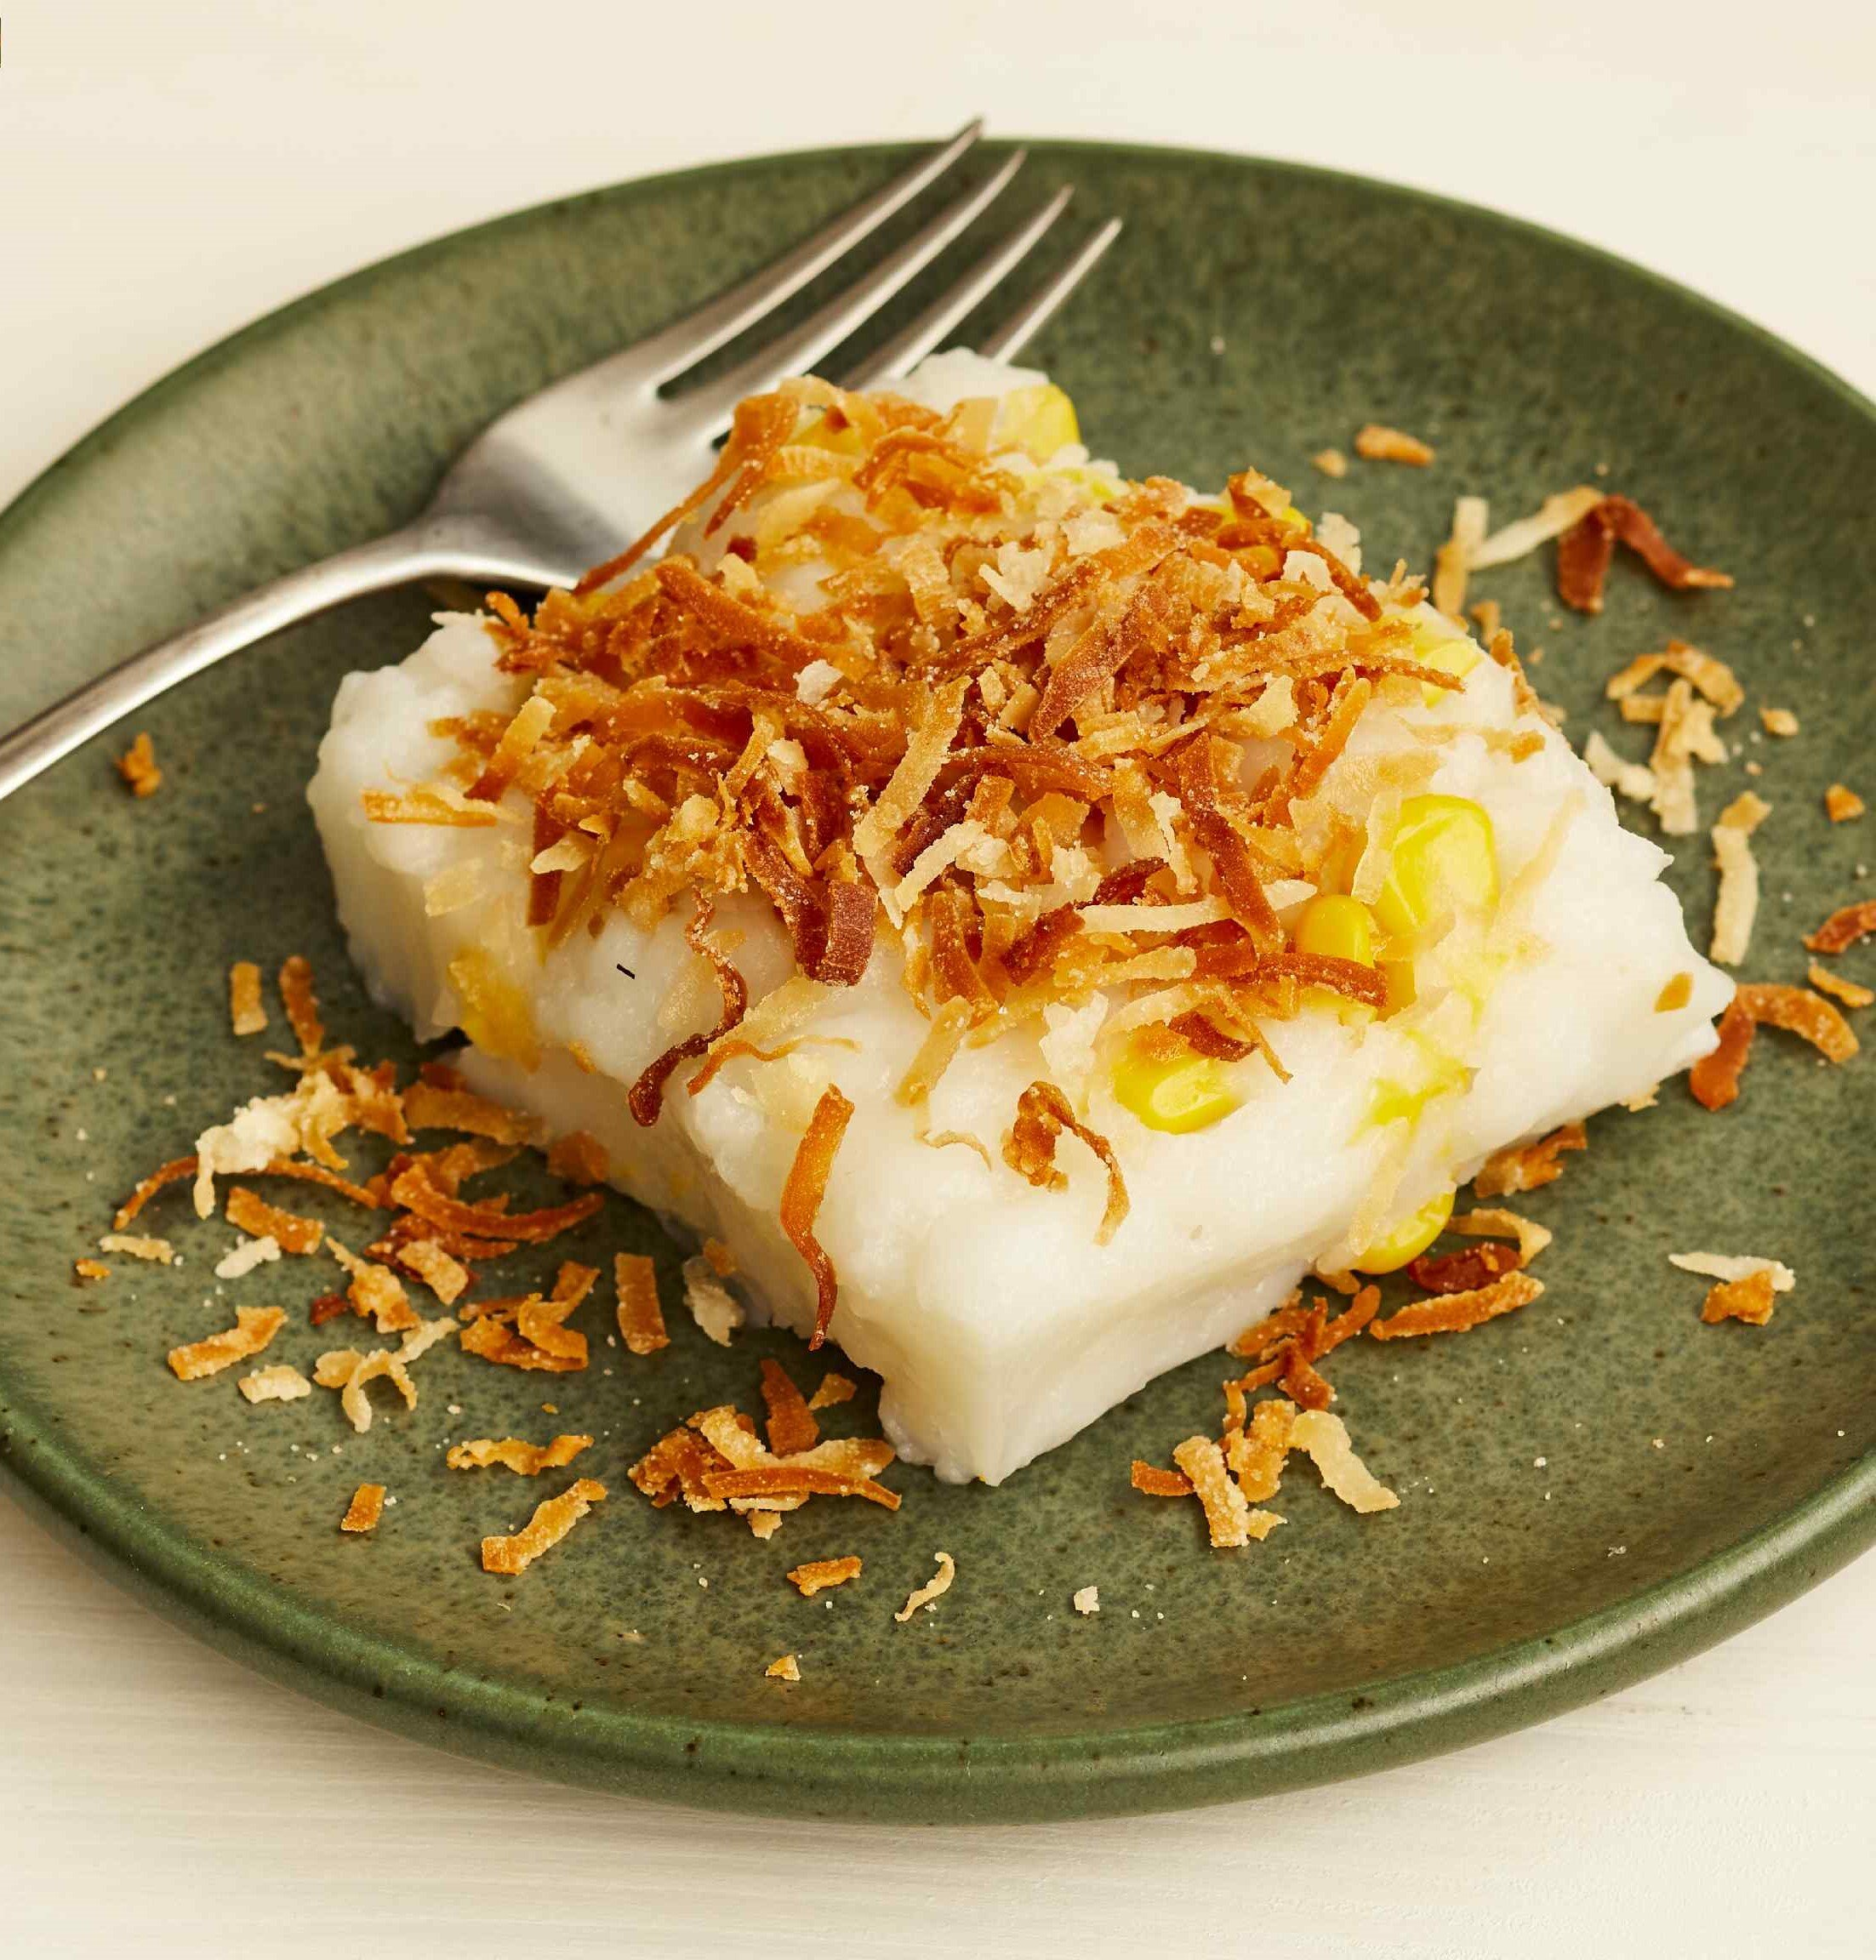 maja blanca coconut pudding recipe